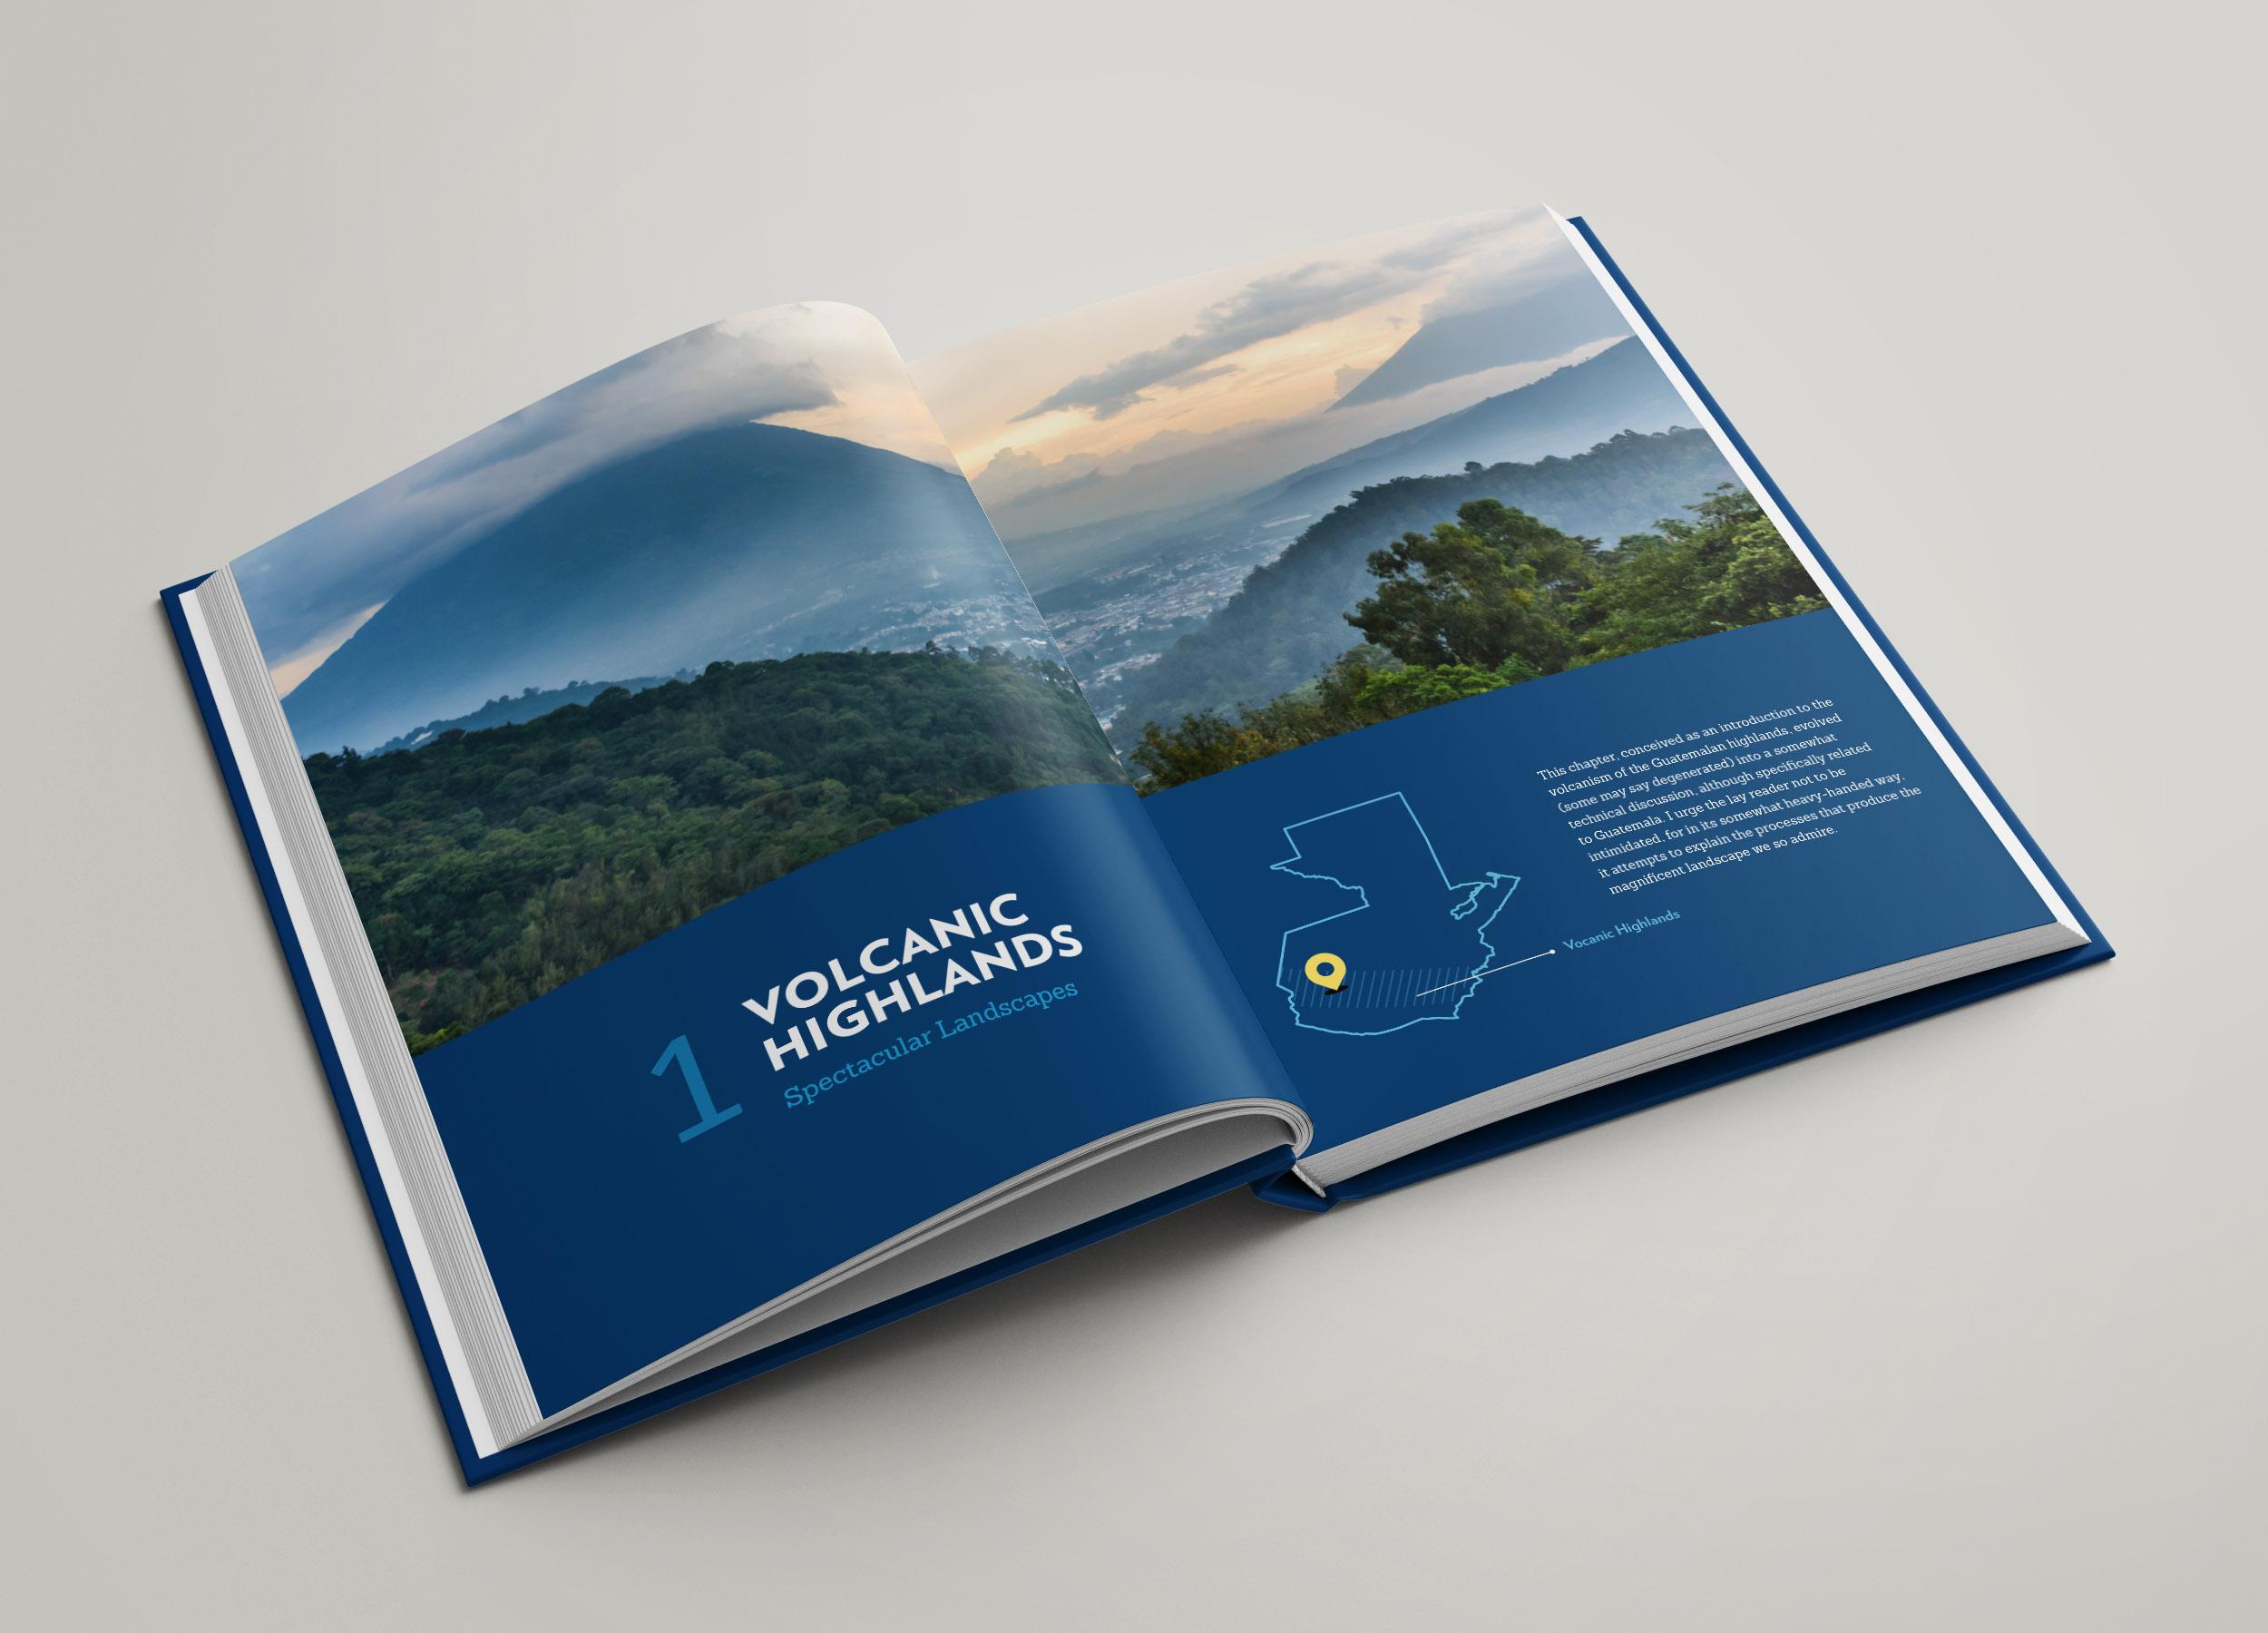 In the volcanic mountains /Diseño: Ximena Chapero